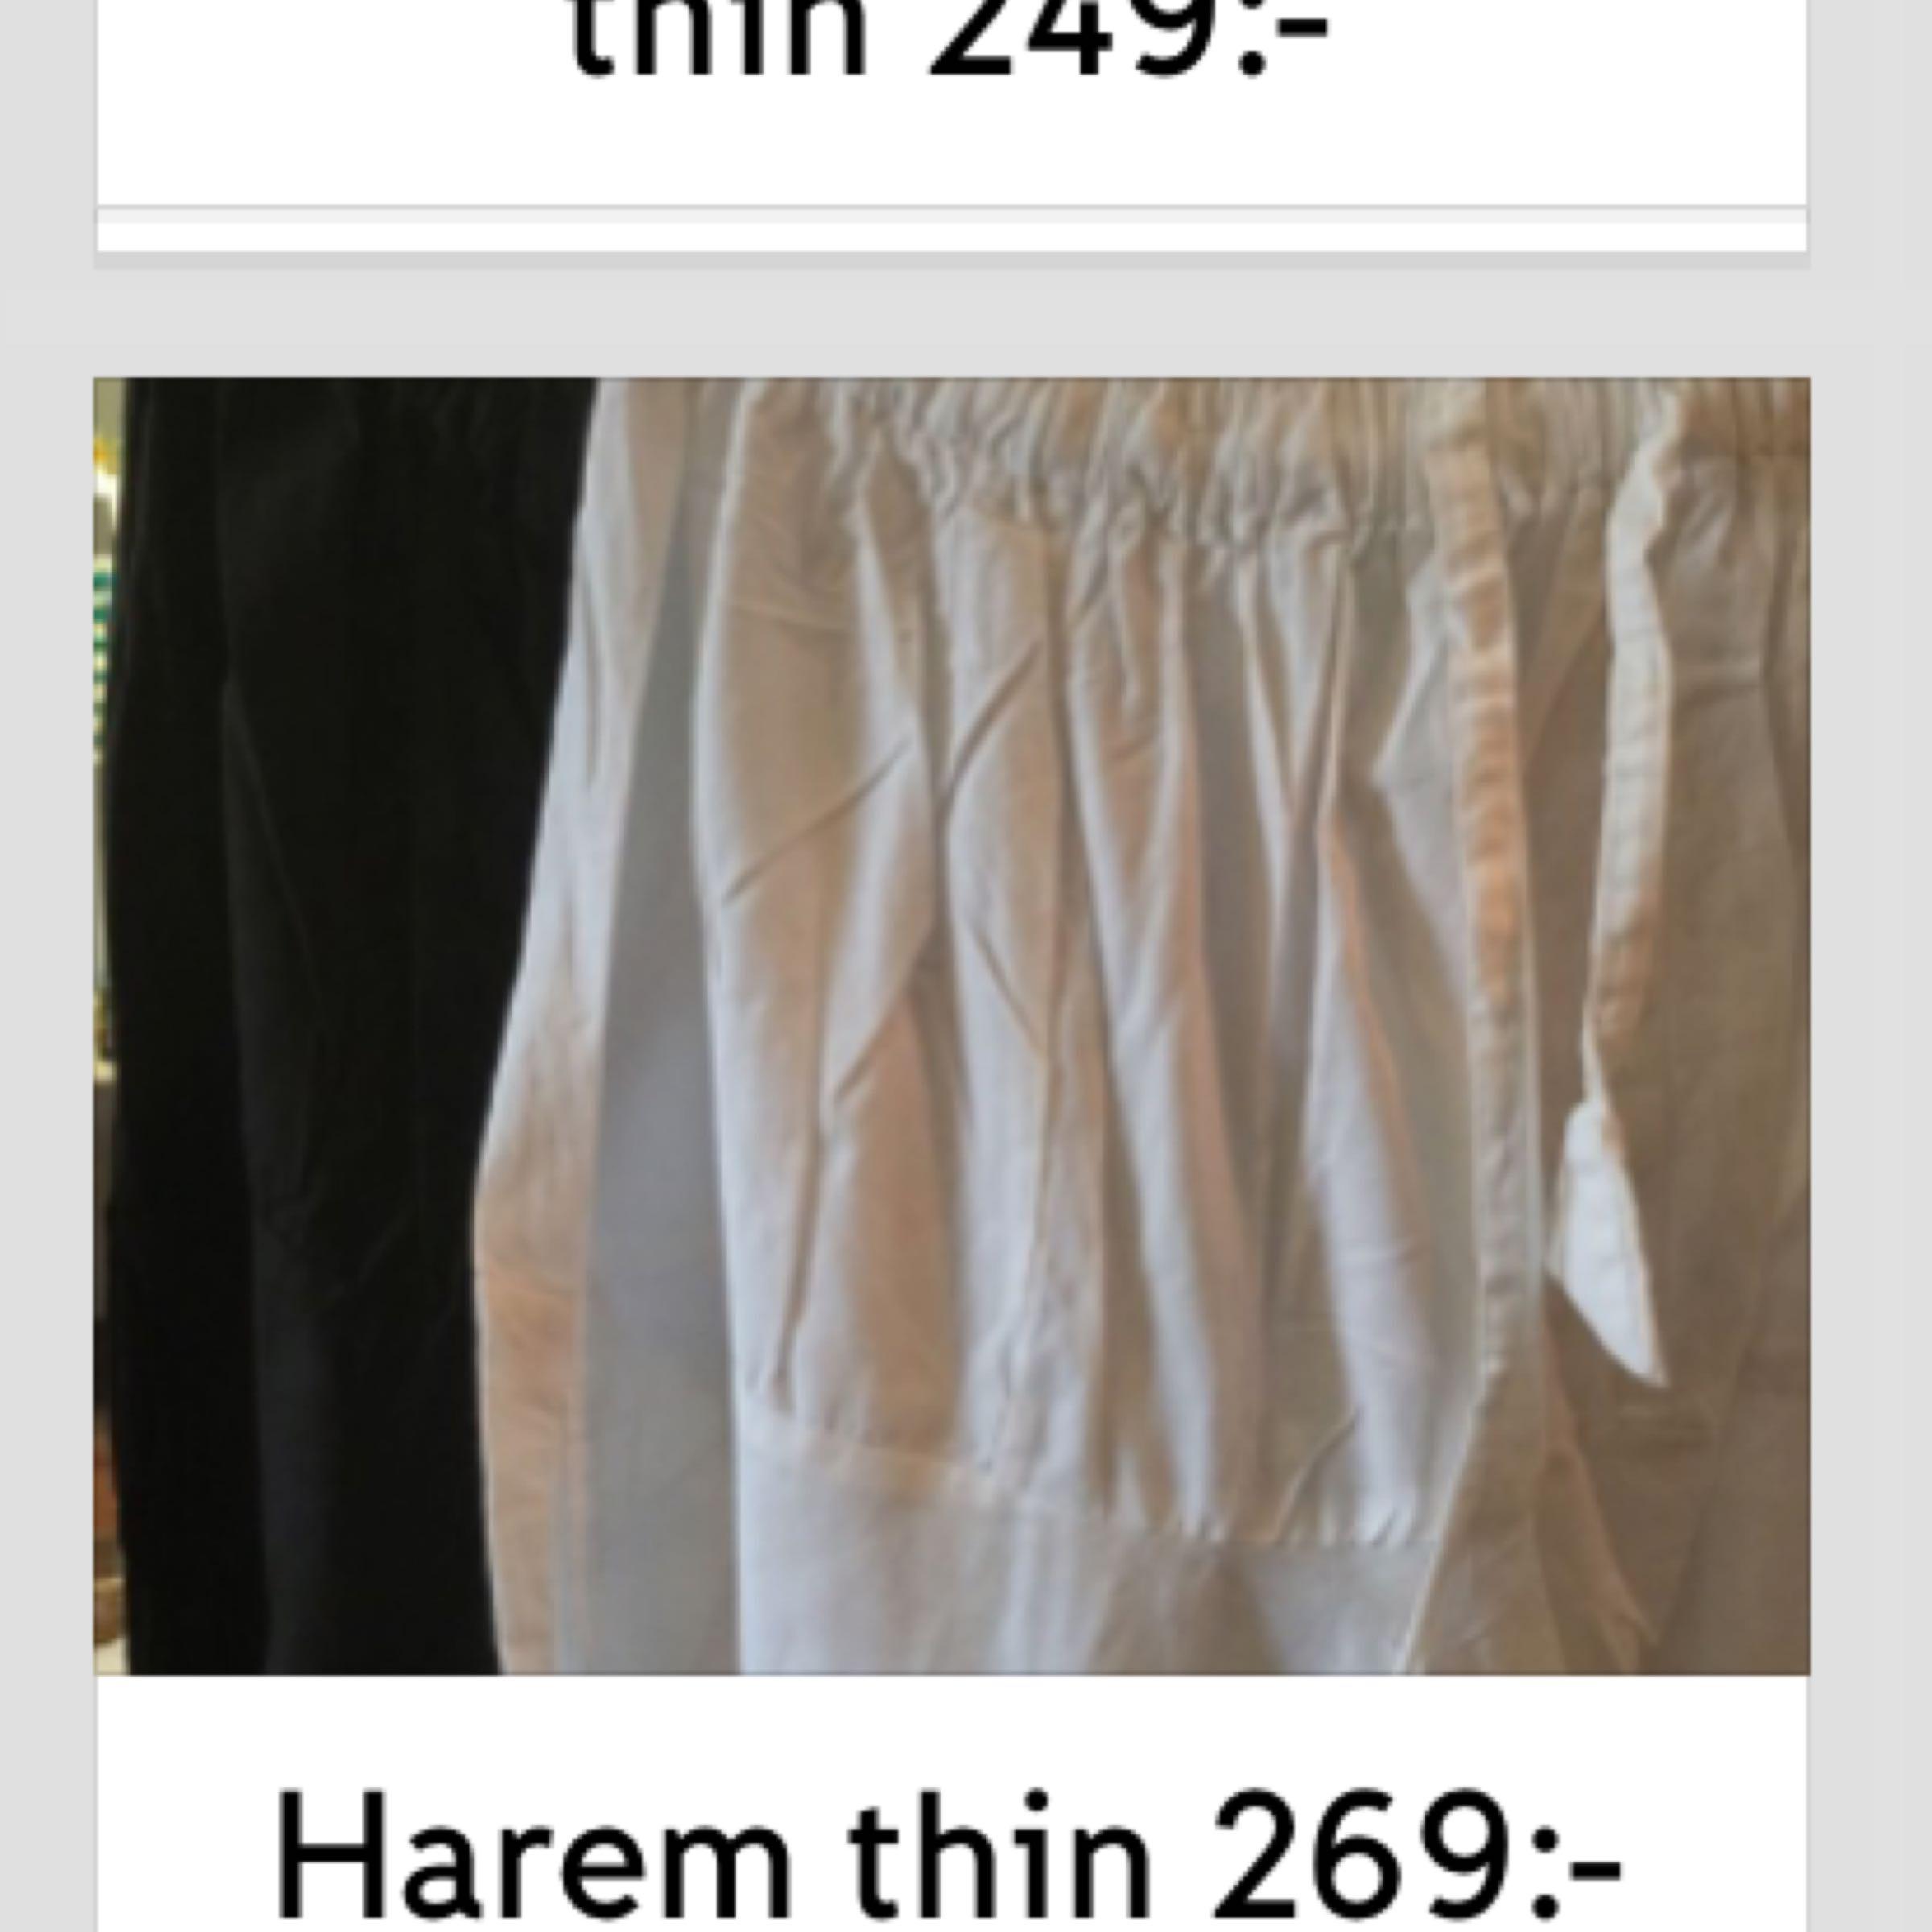 Harem cotton 269:-